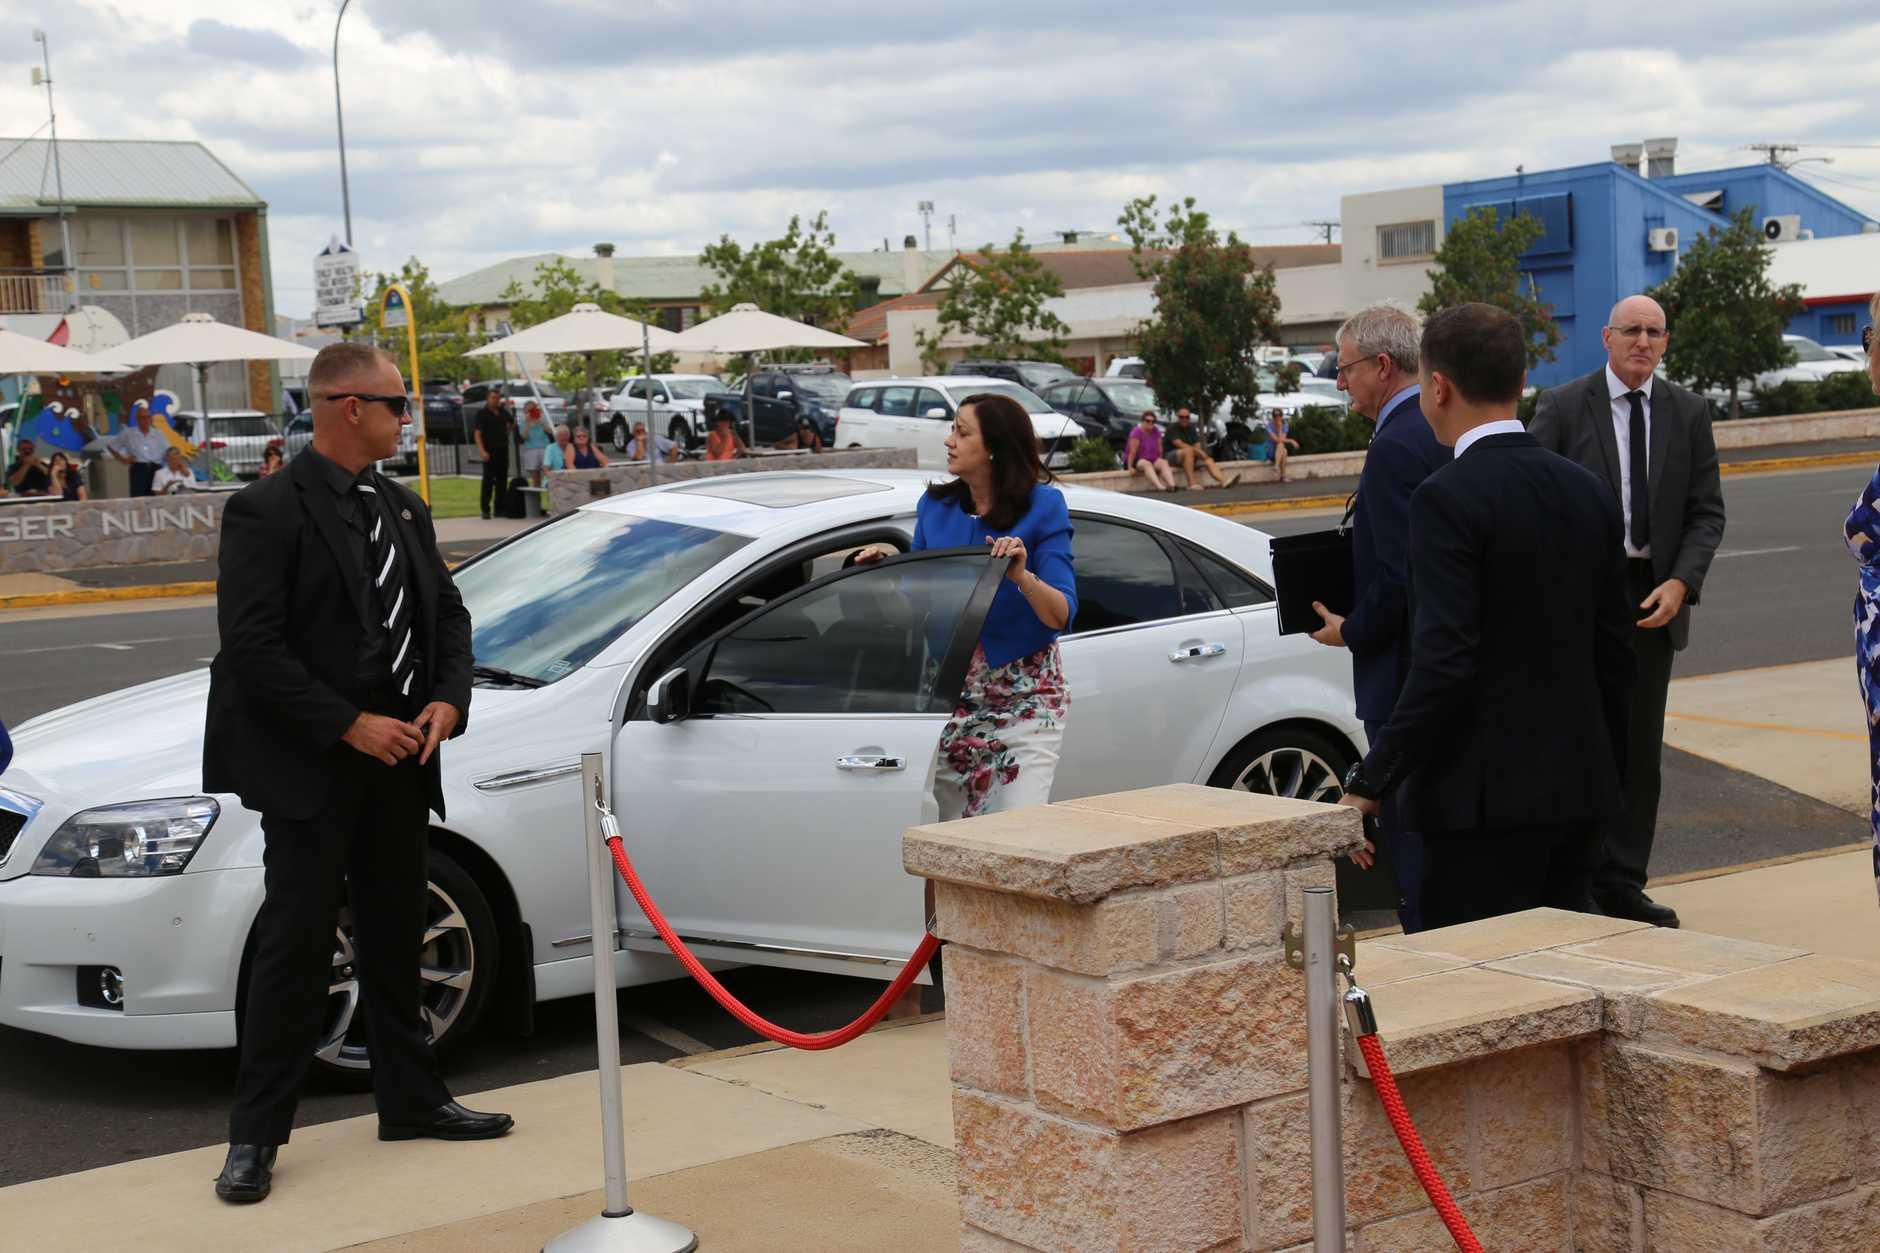 Premier Annastacia Palaszczuk arrives for Lady Flo's state funeral.